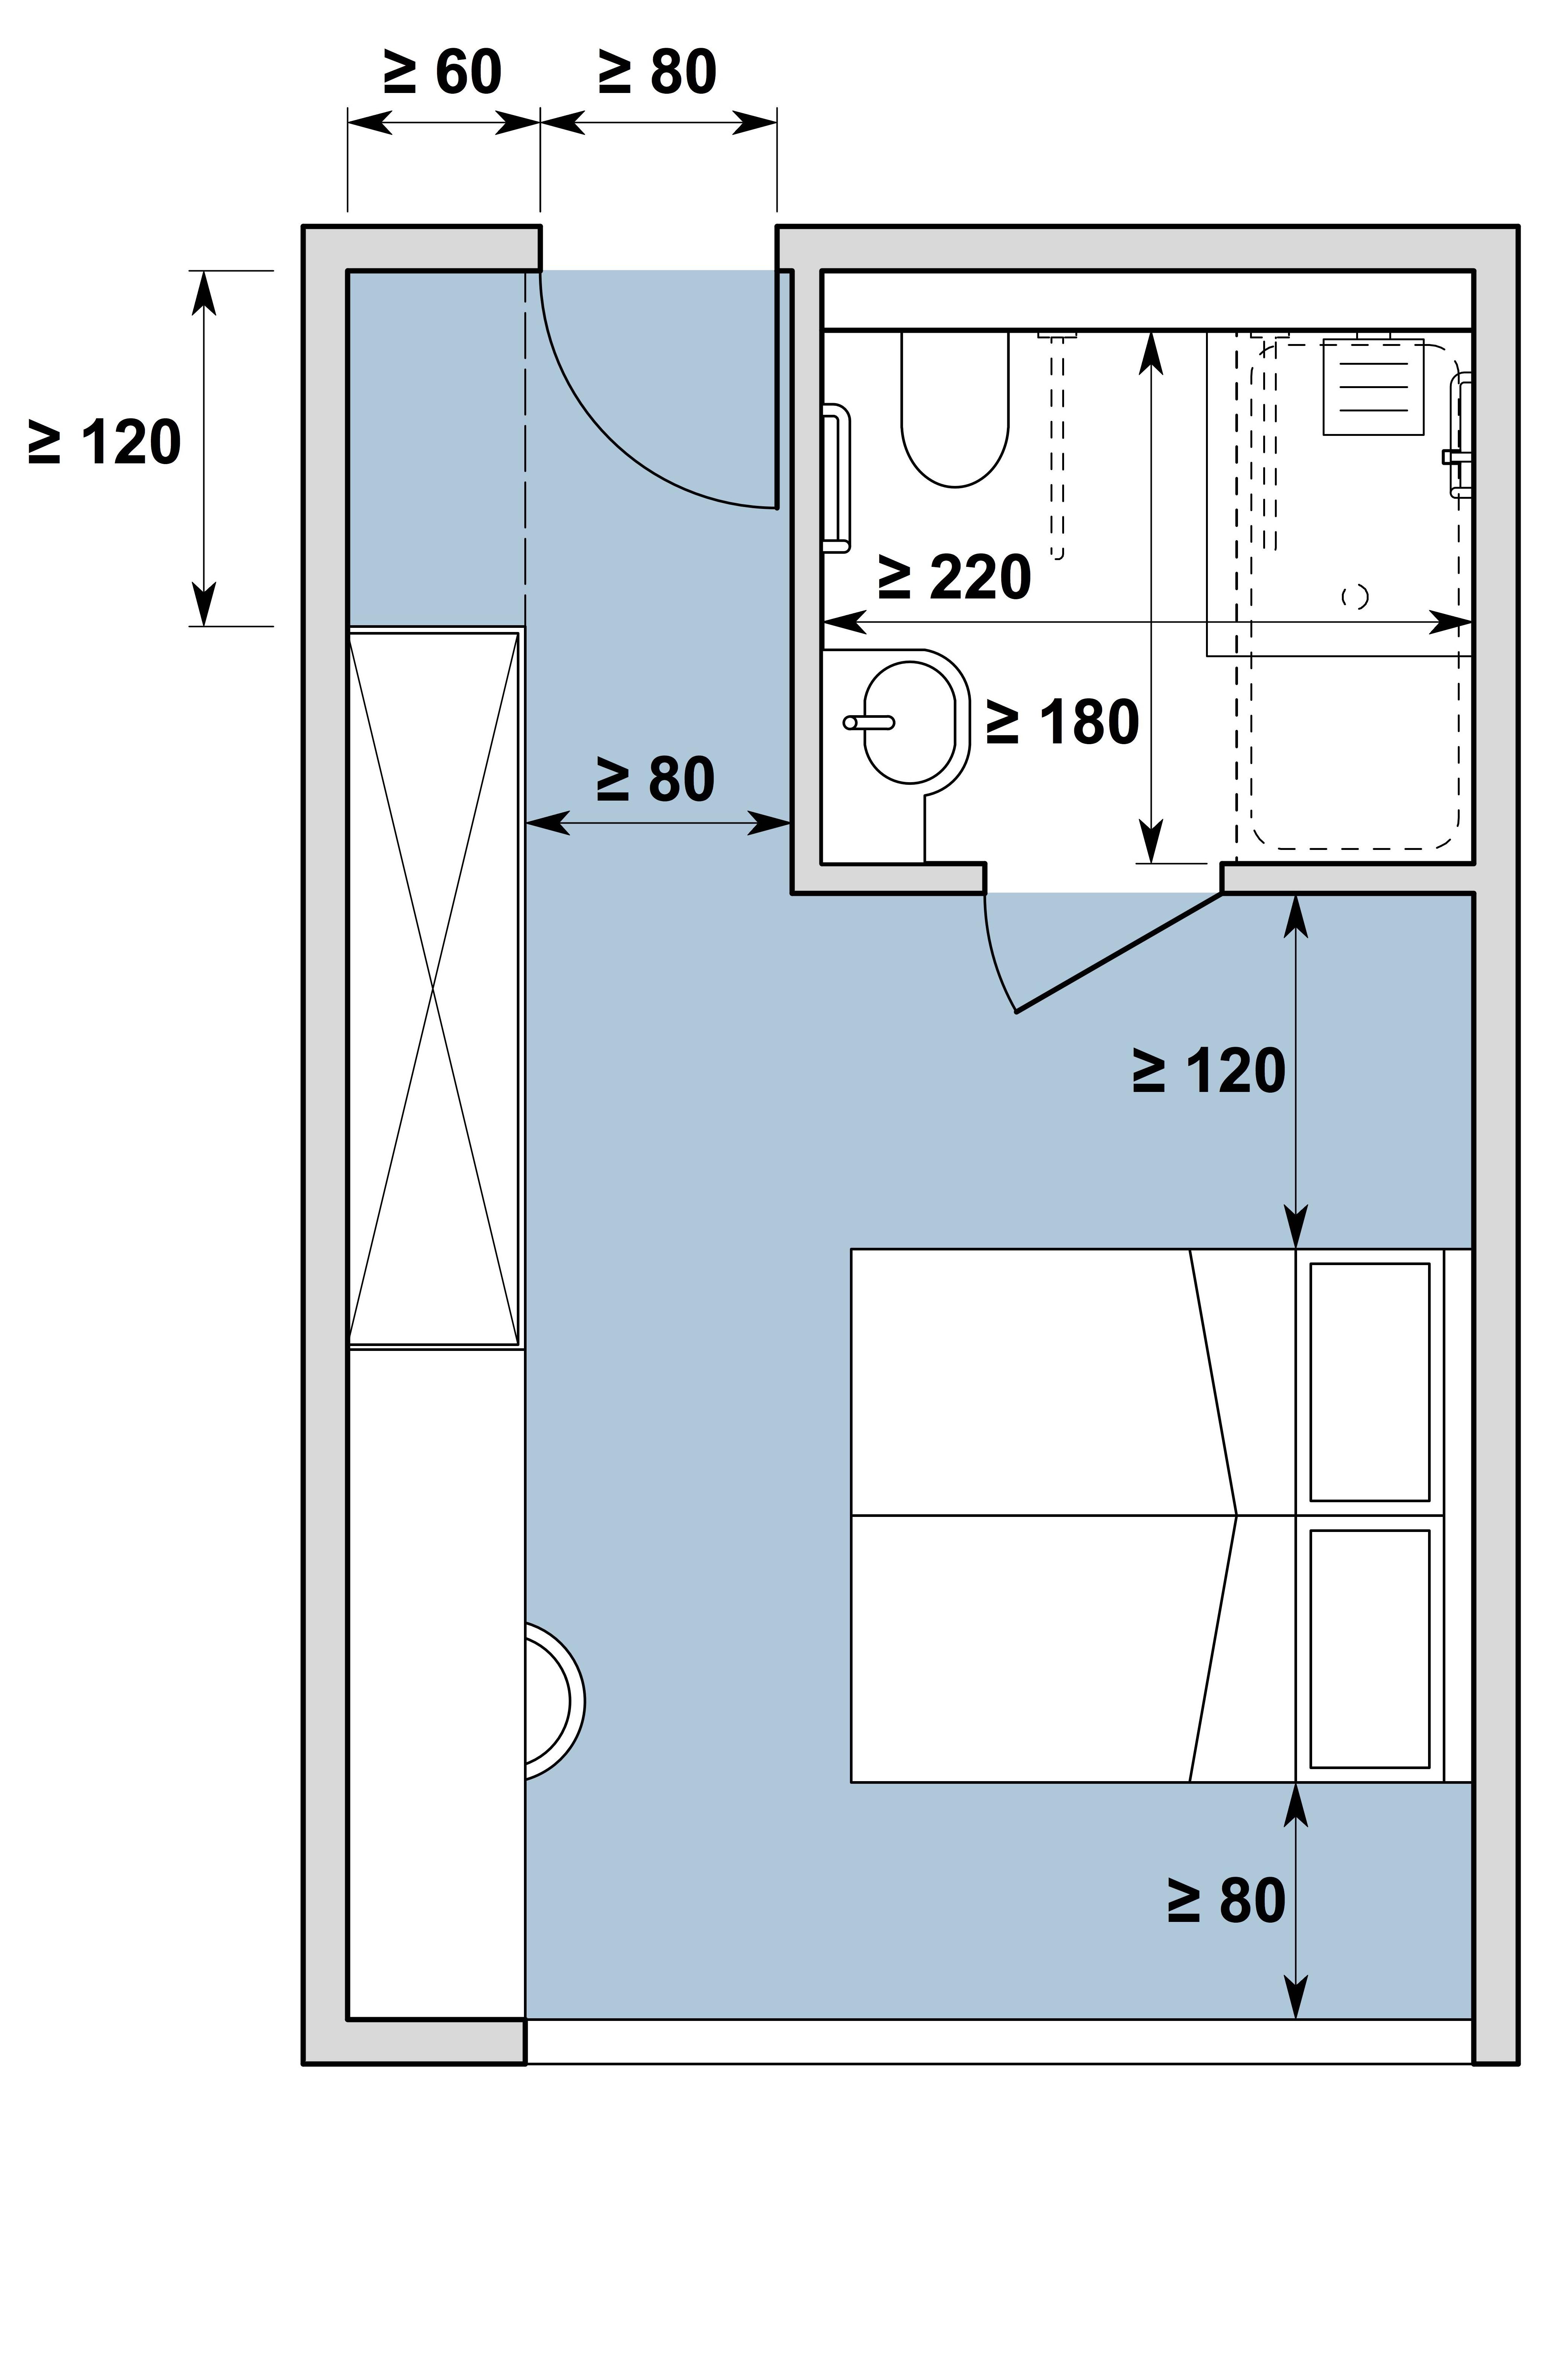 Chambre d'hôtes / Gästezimmer Typ II, variante b